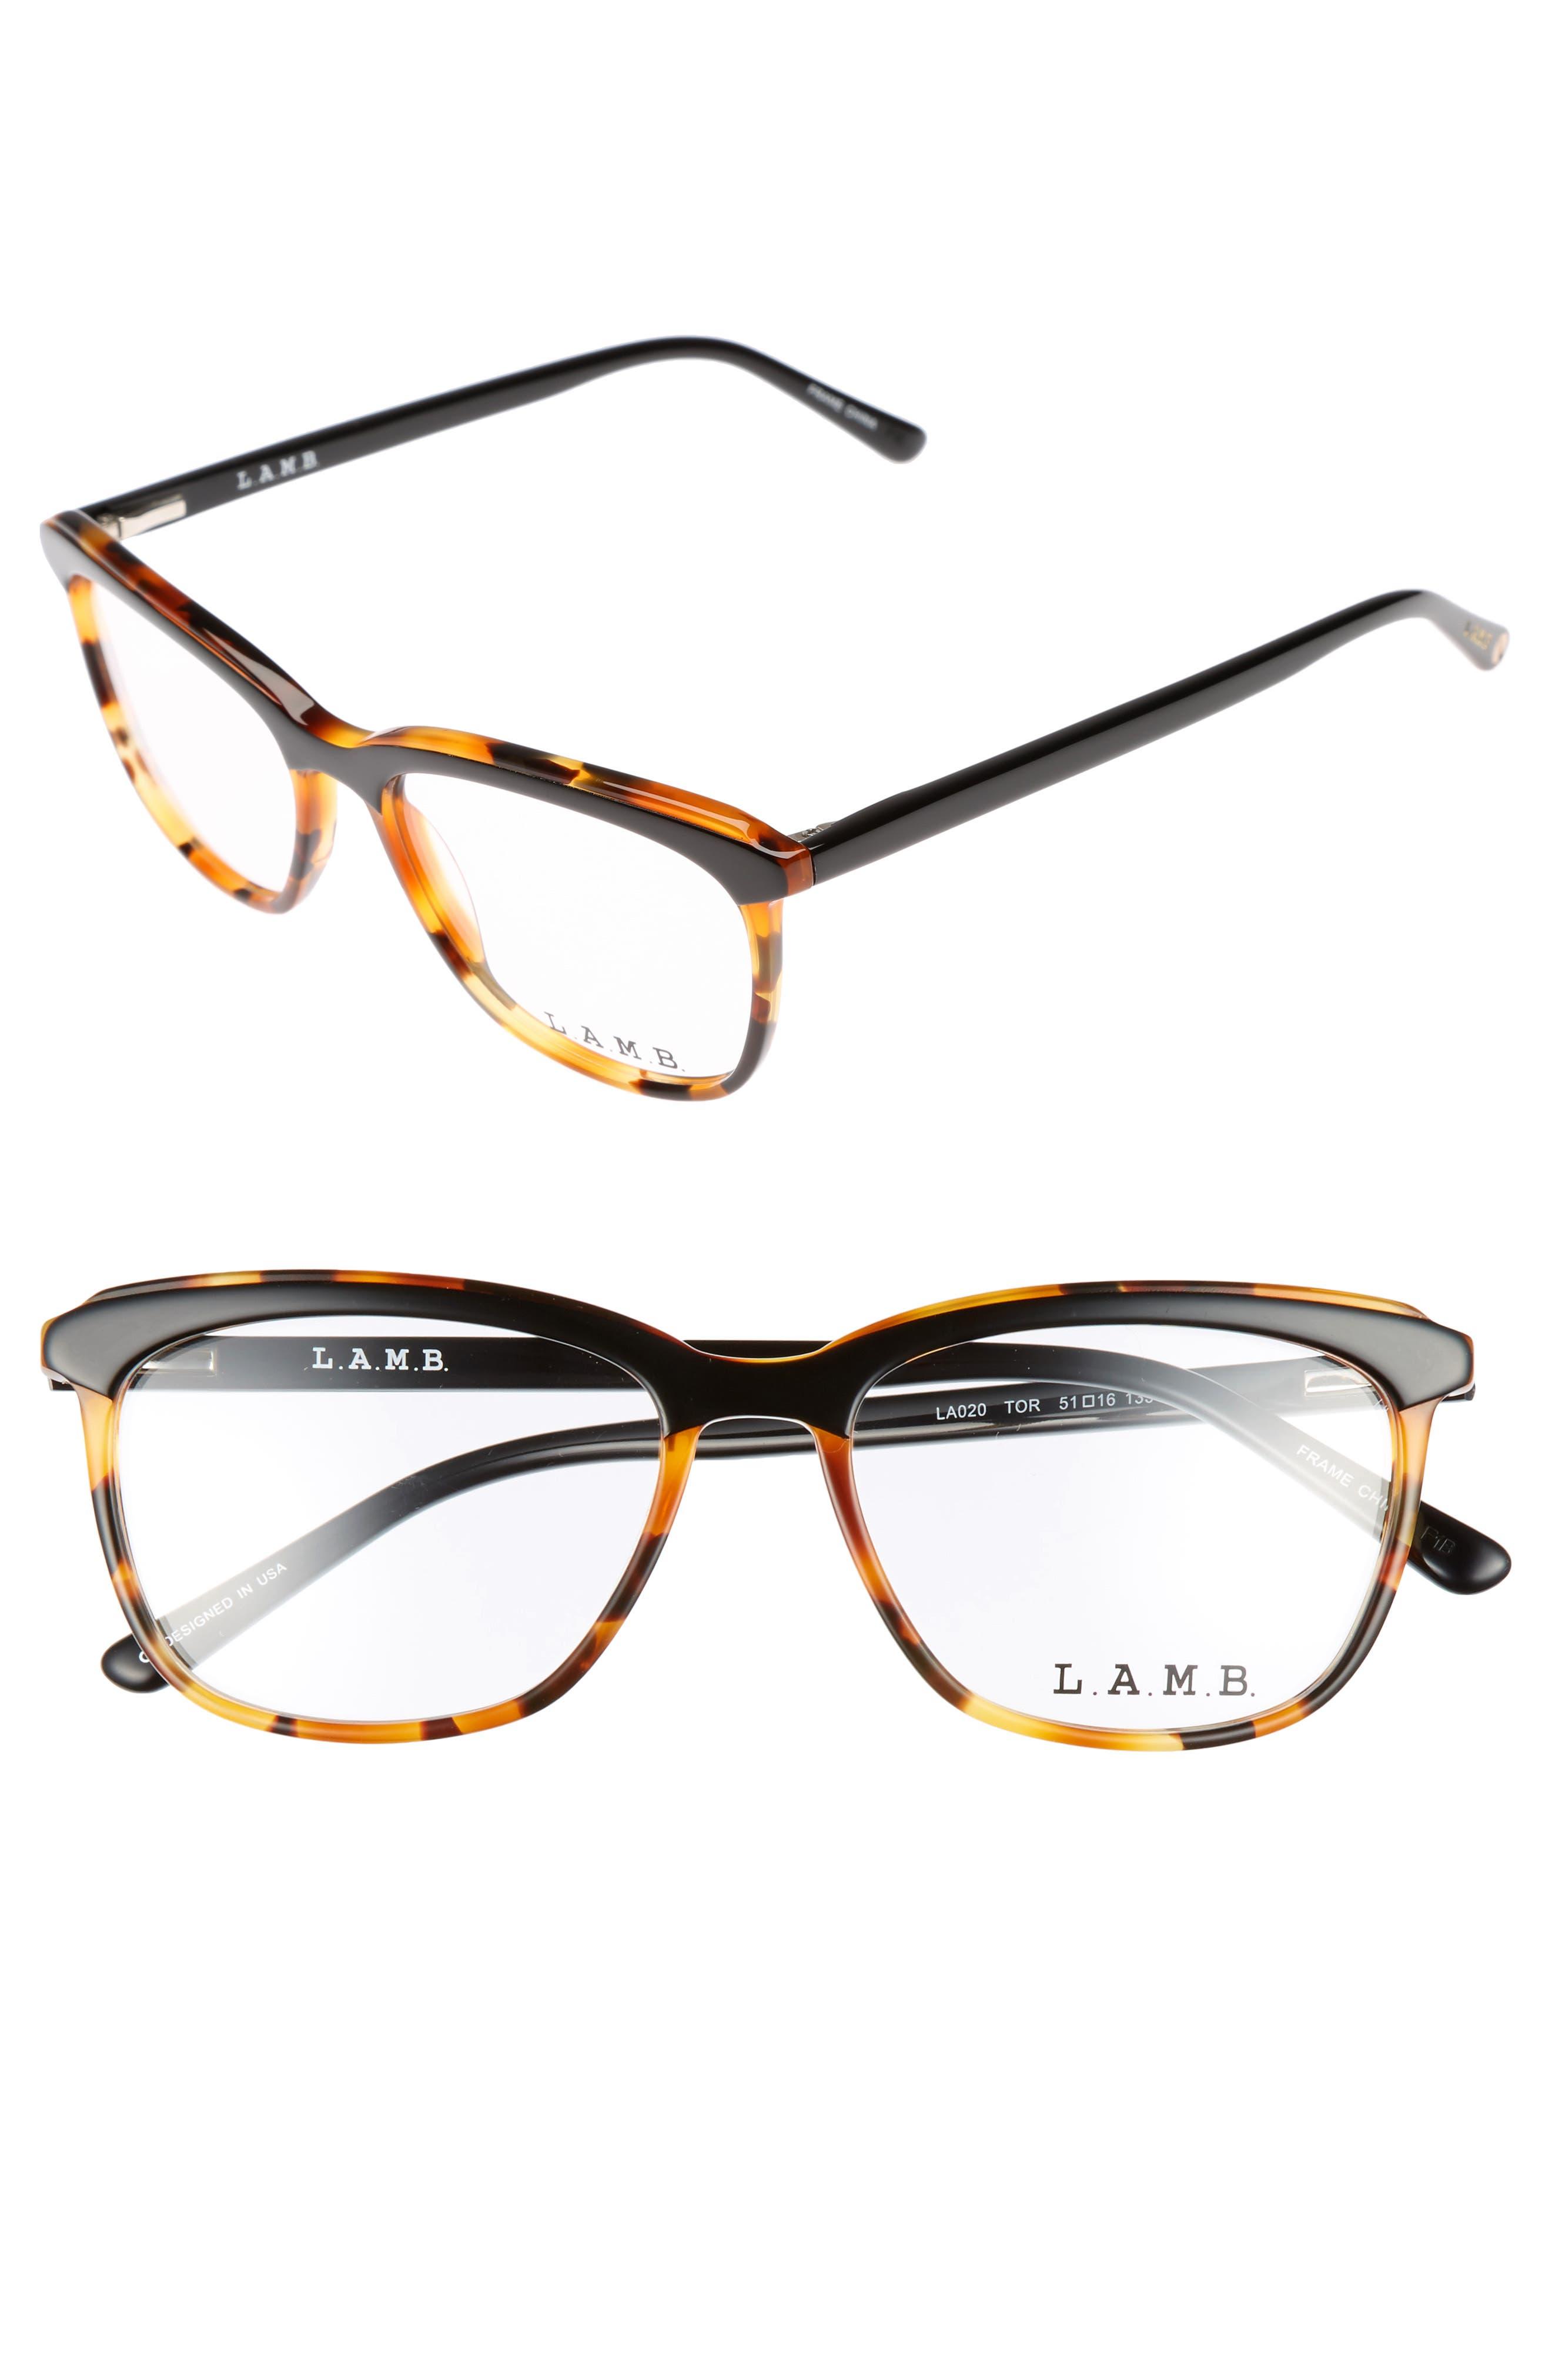 Main Image - L.A.M.B. 51mm Optical Square Glasses